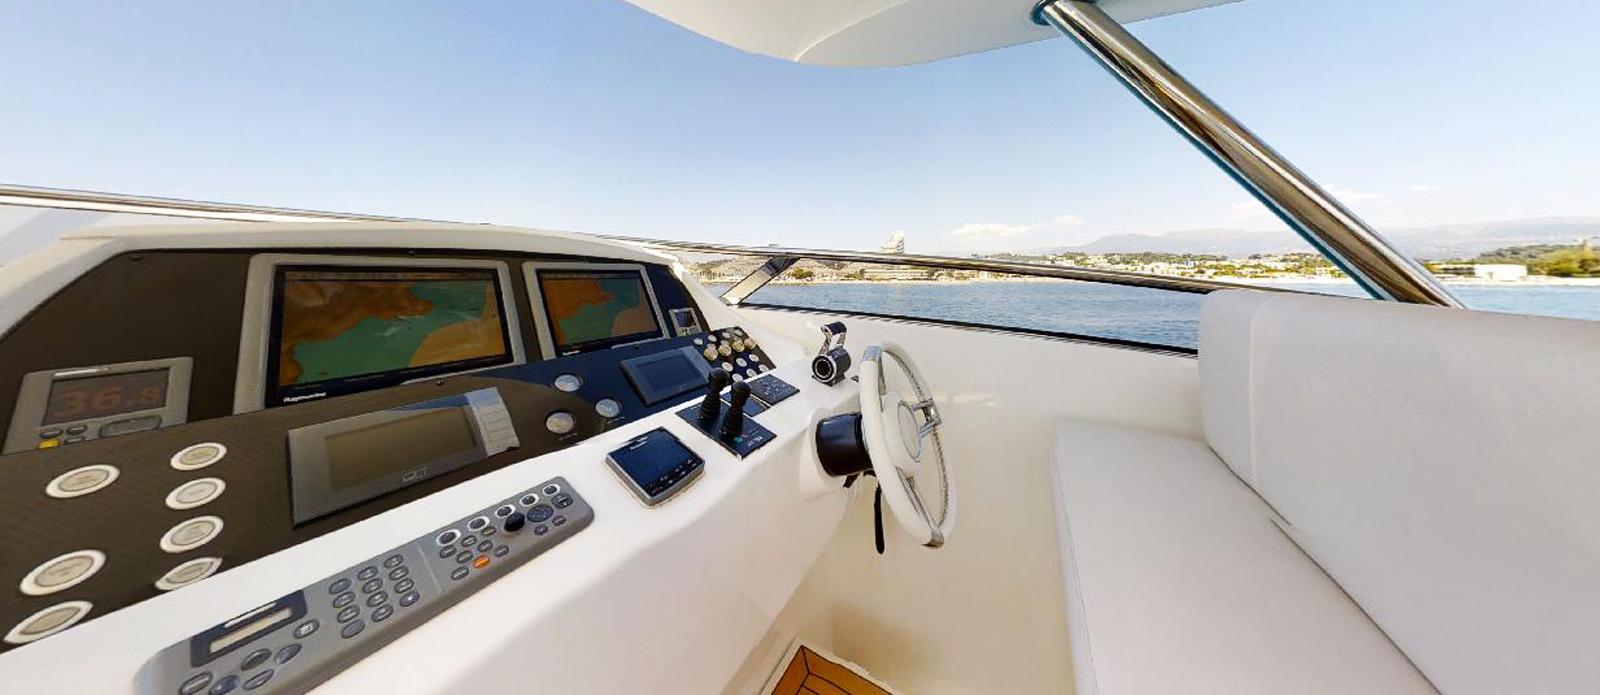 Sunseeker 30 Metre Yacht - Helm - Tuppence